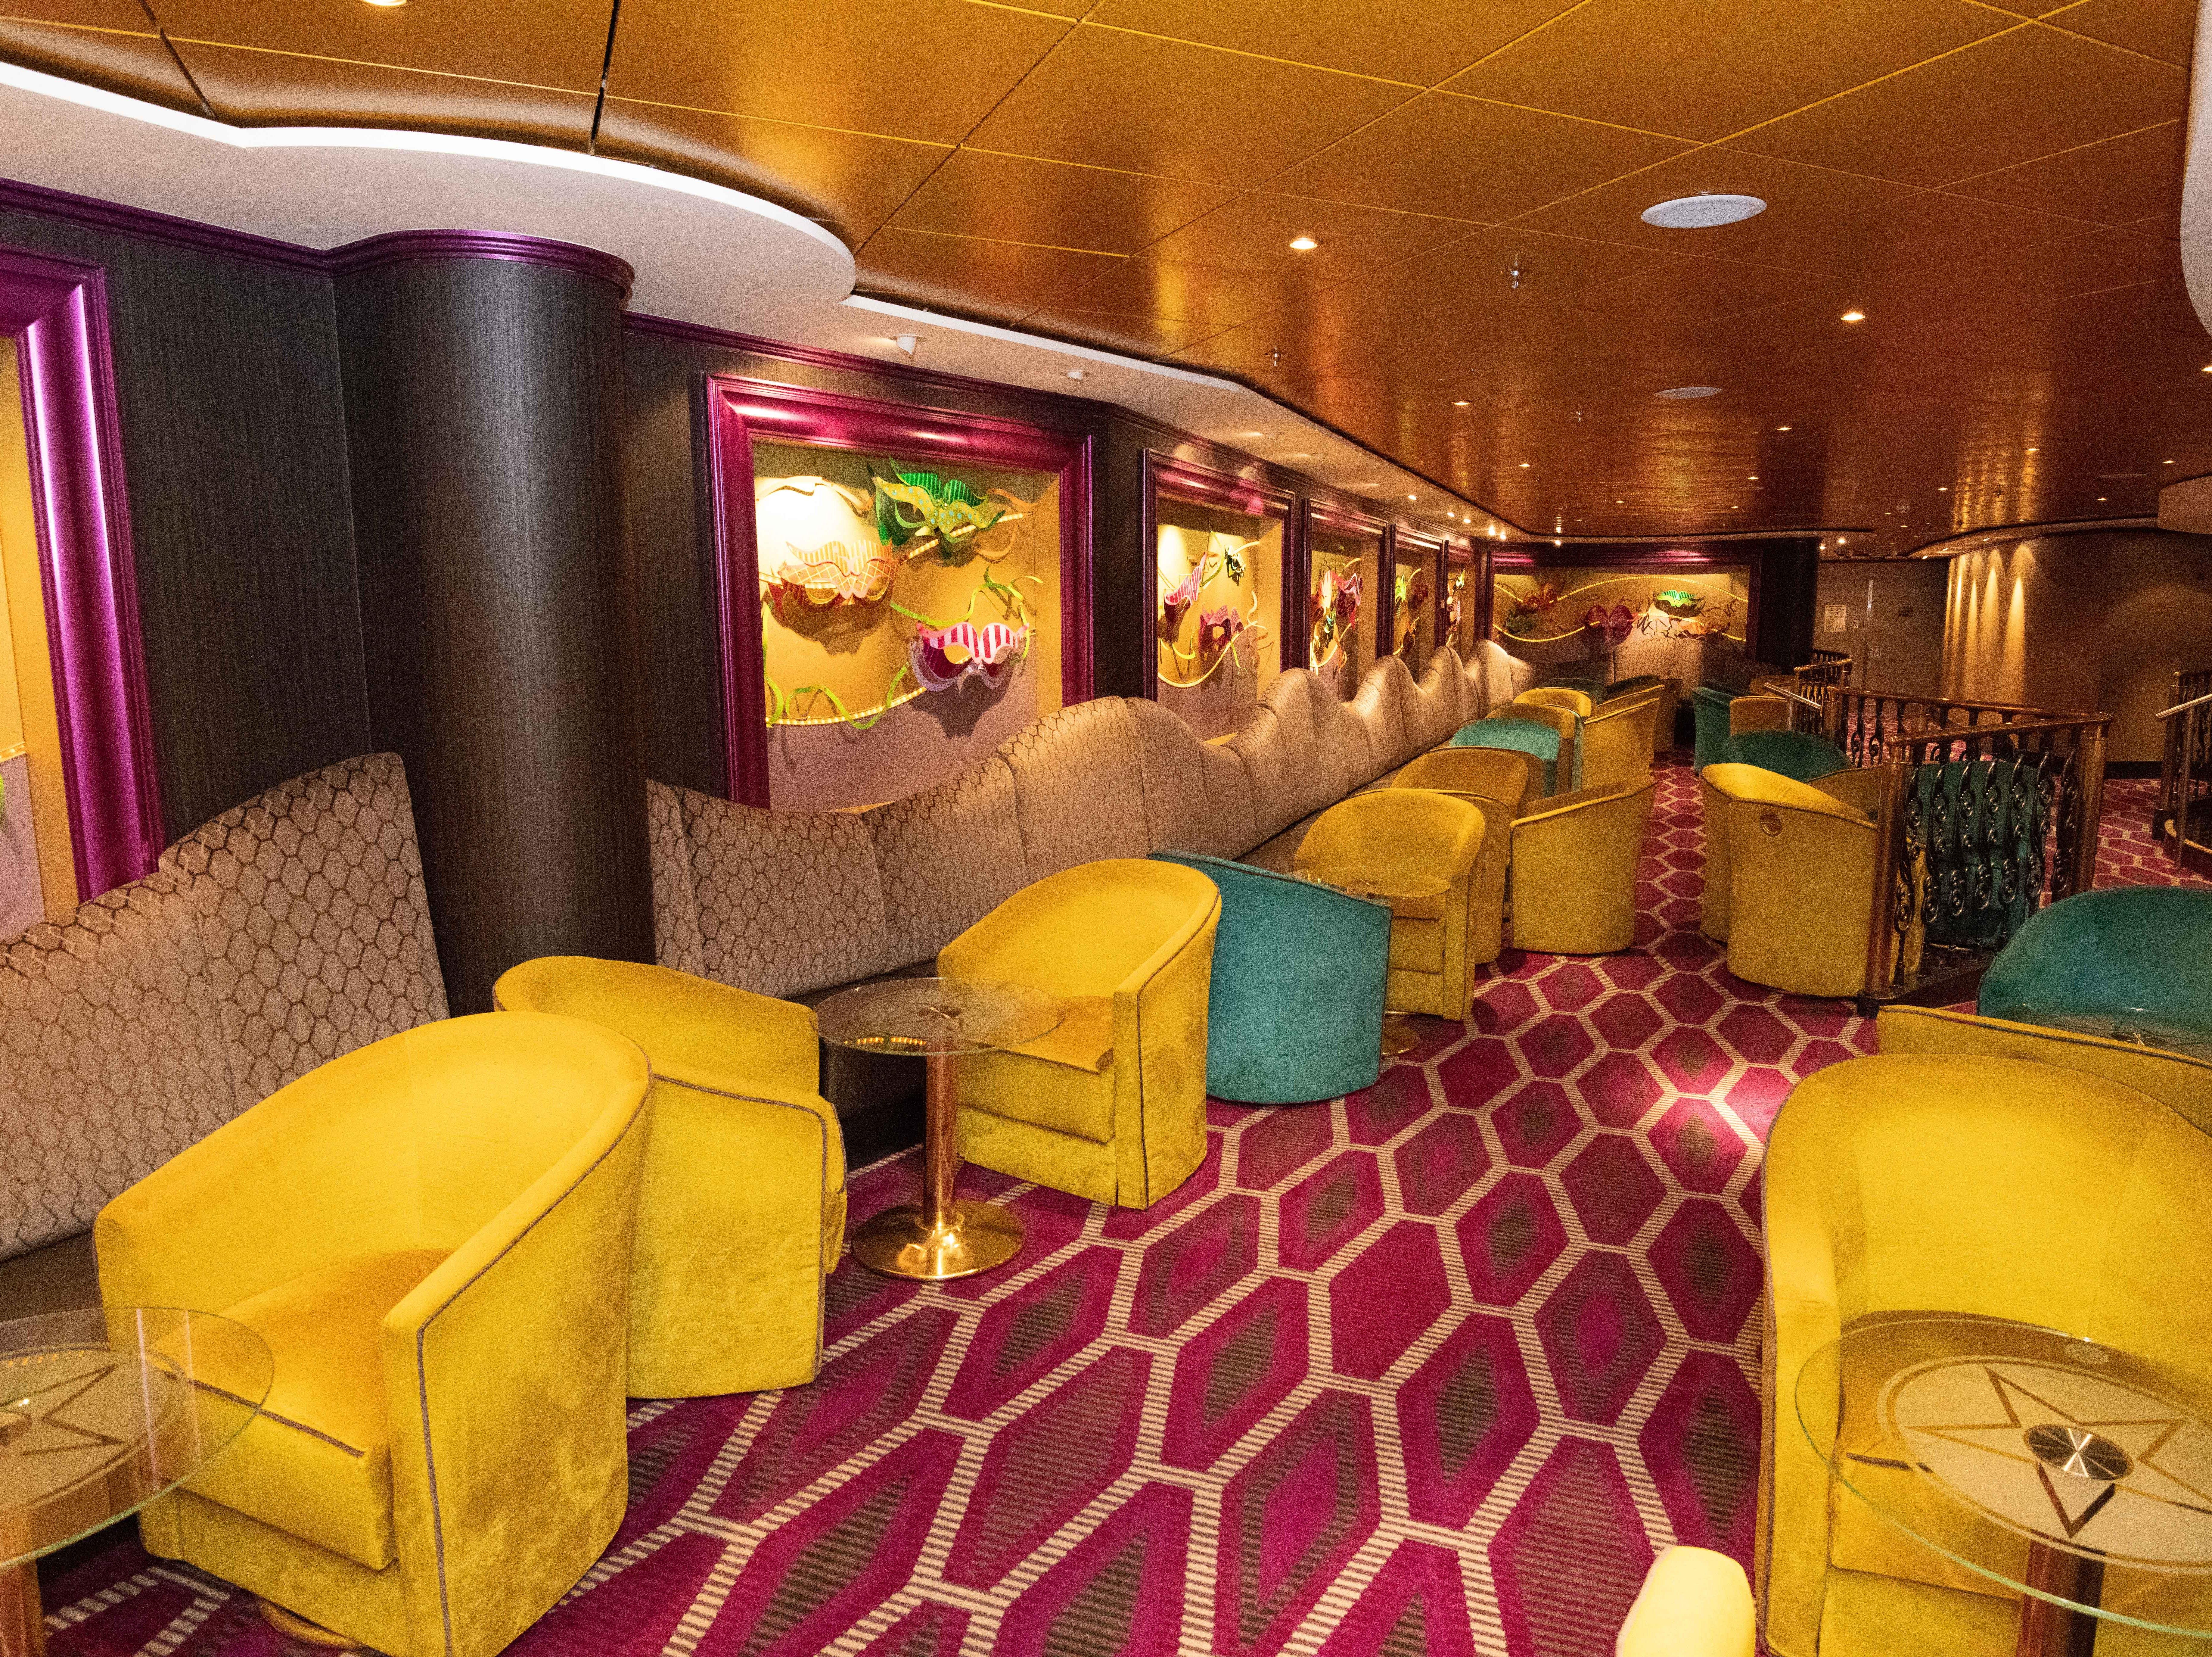 A seating area at the Mardi Gras Cabaret Lounge & Nightclub.